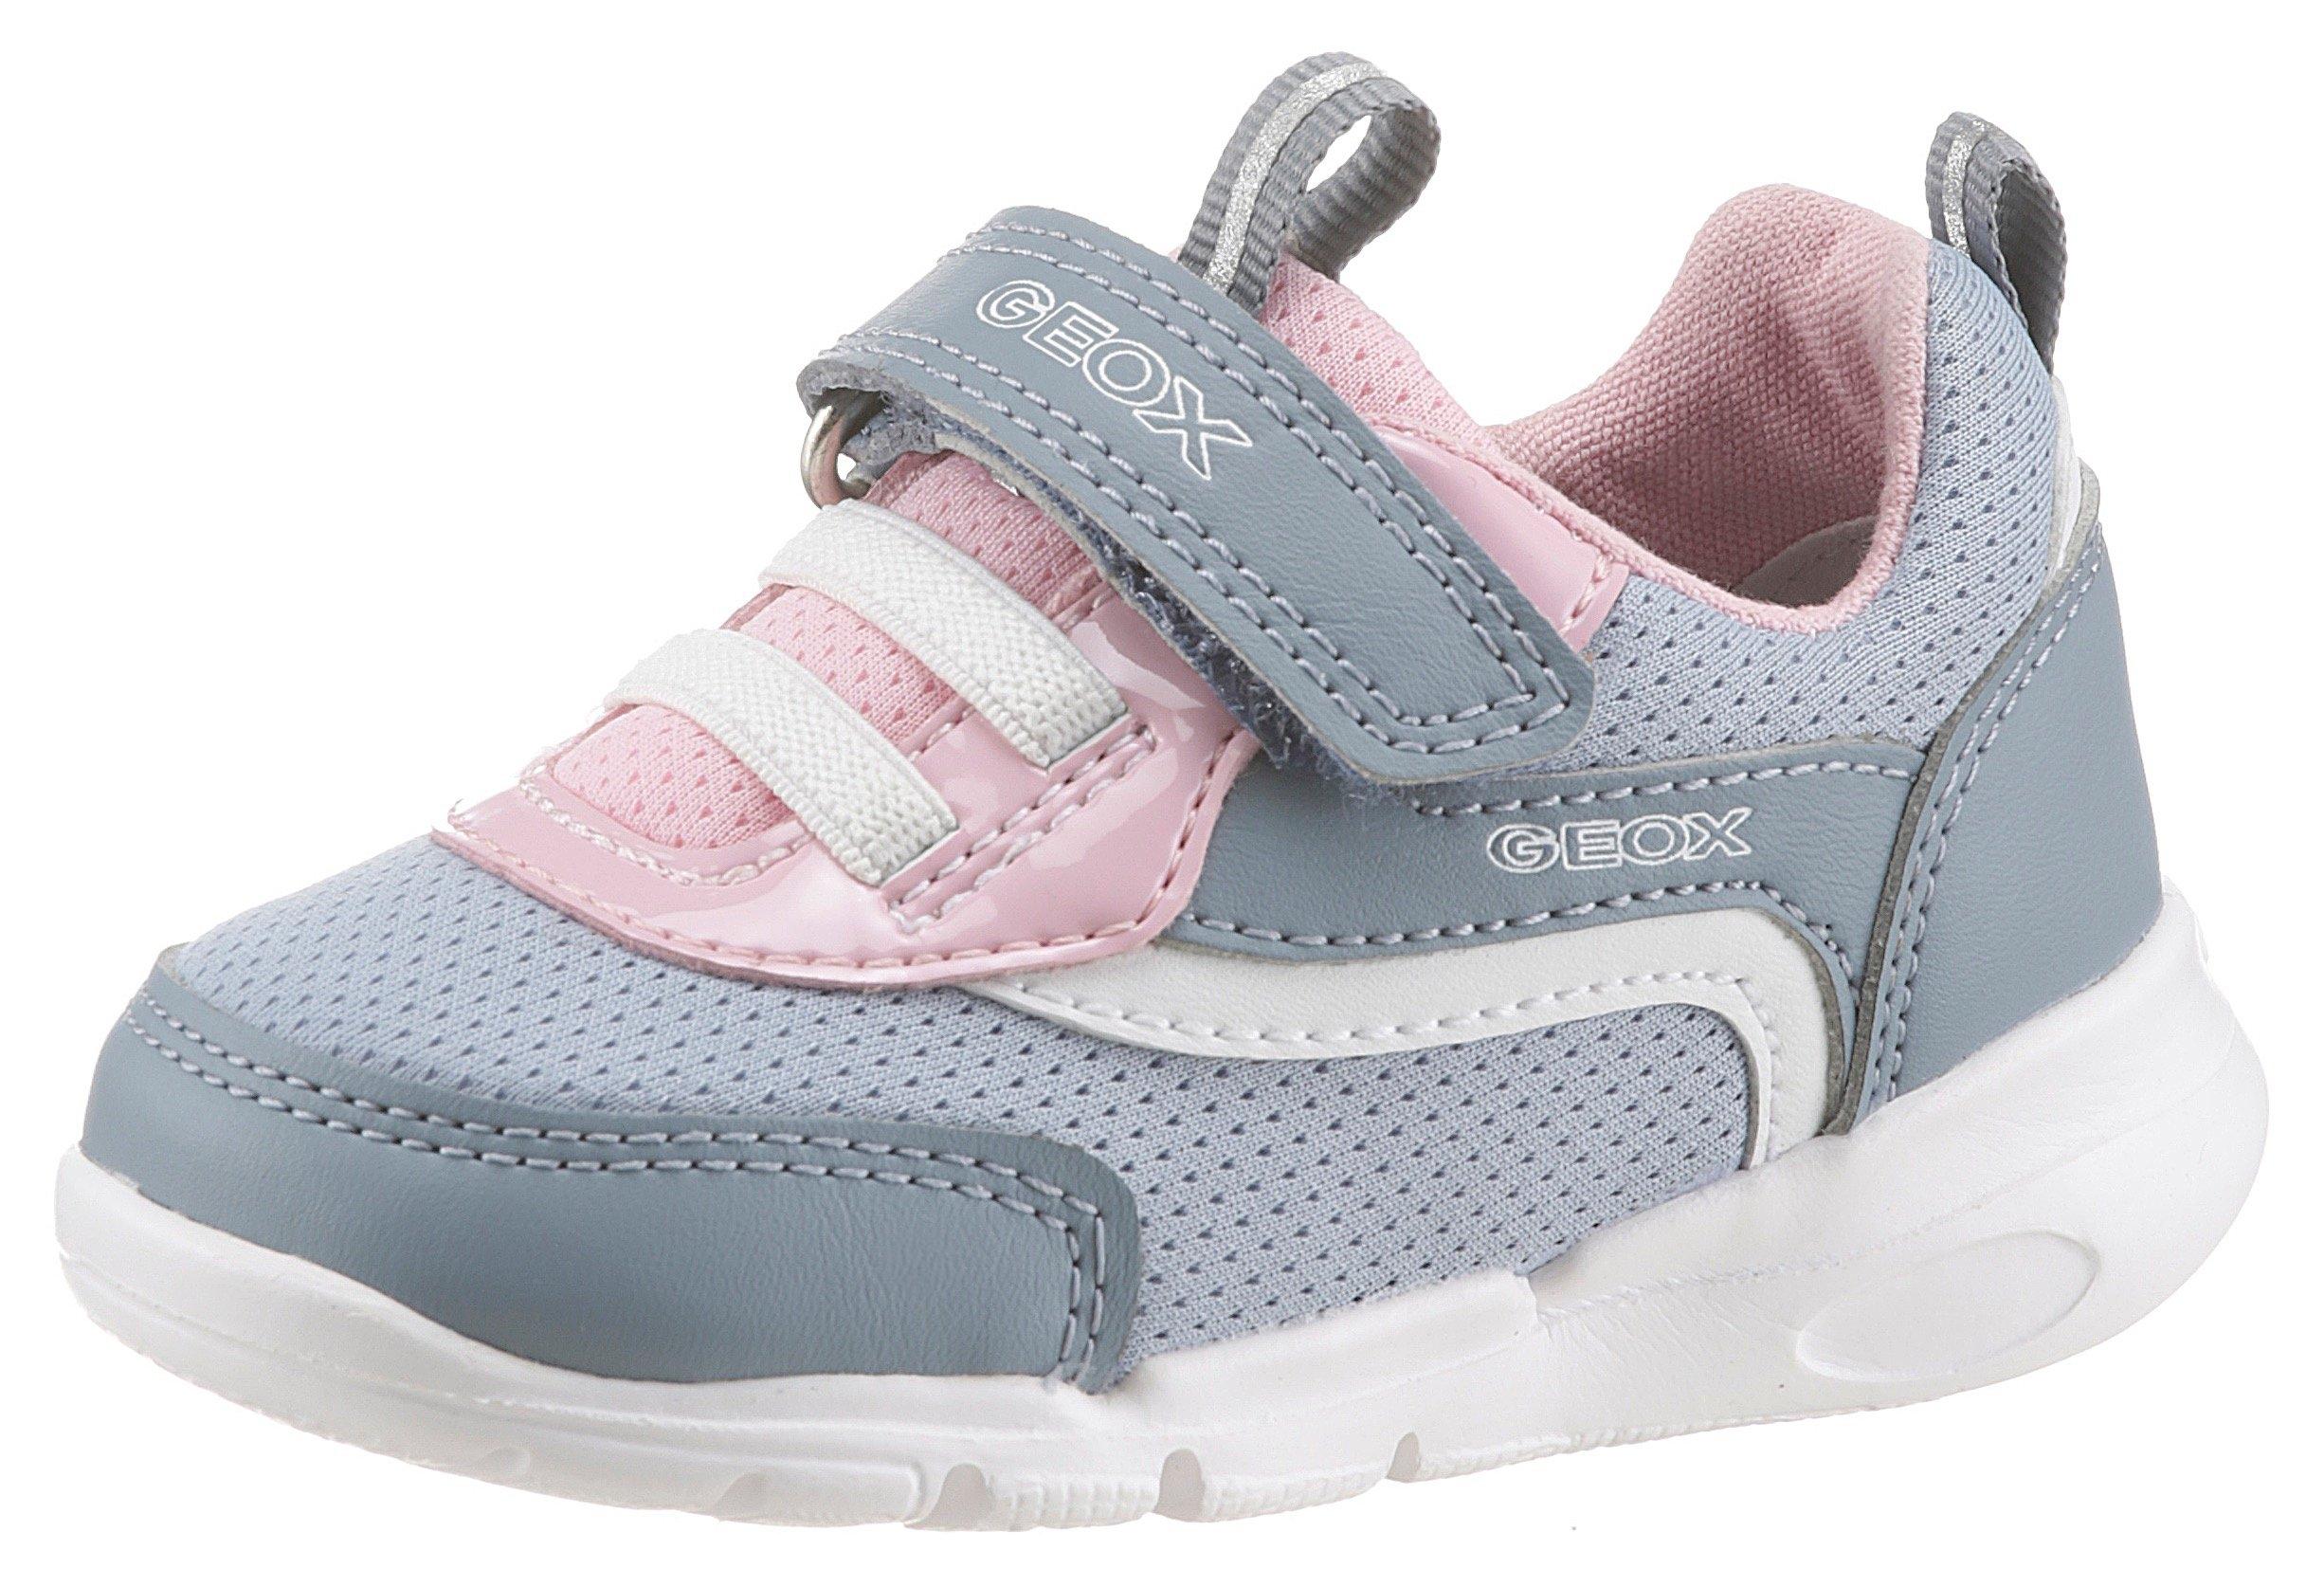 Geox Kids sneakers B Runner Girl met klittenbandsluiting nu online bestellen